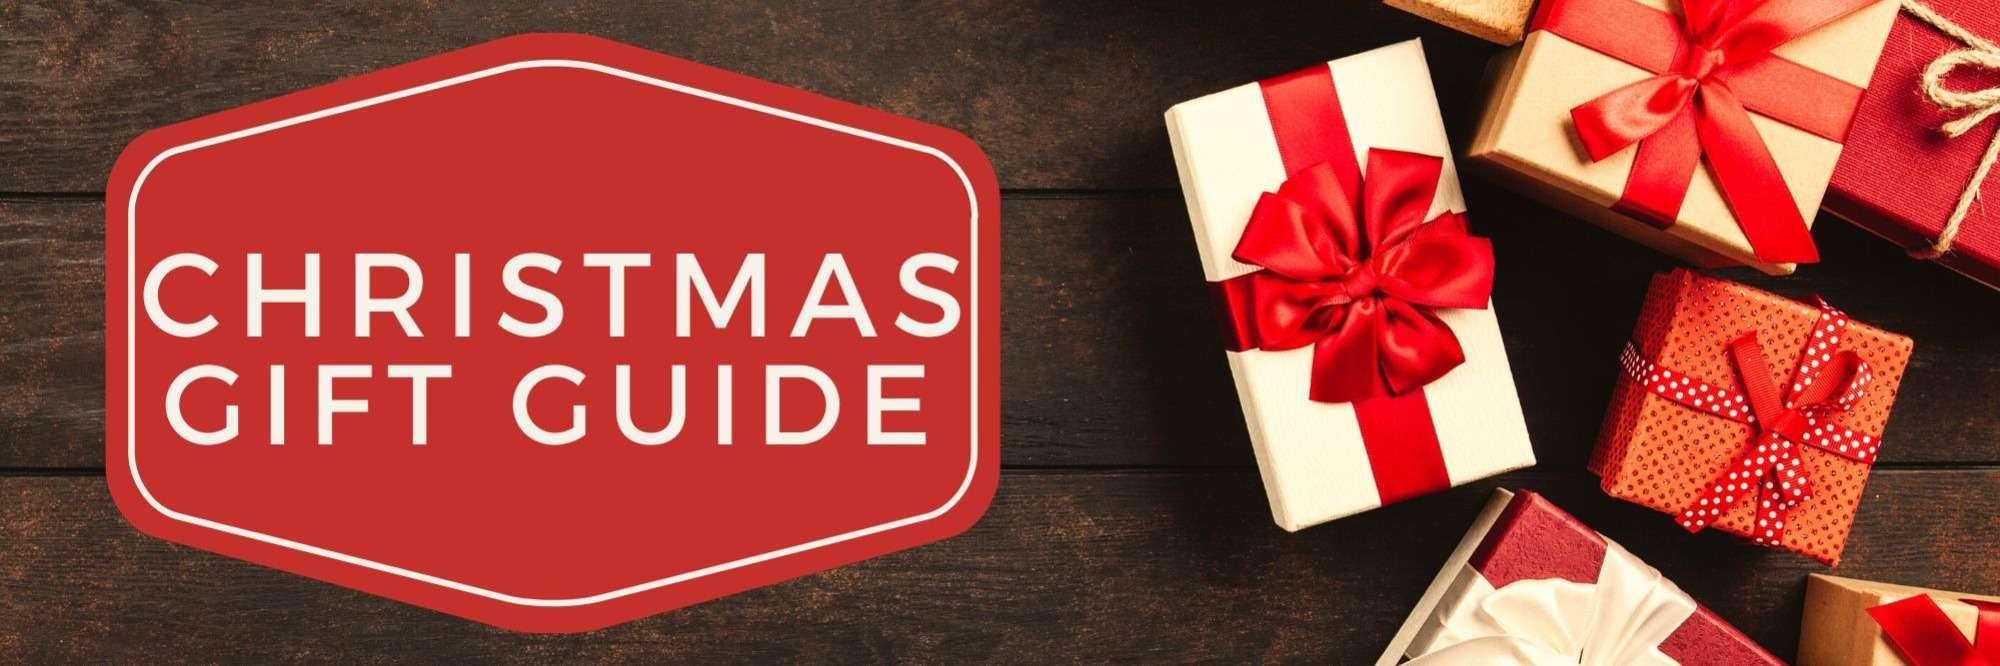 Cranky's Christmas Gift Guide